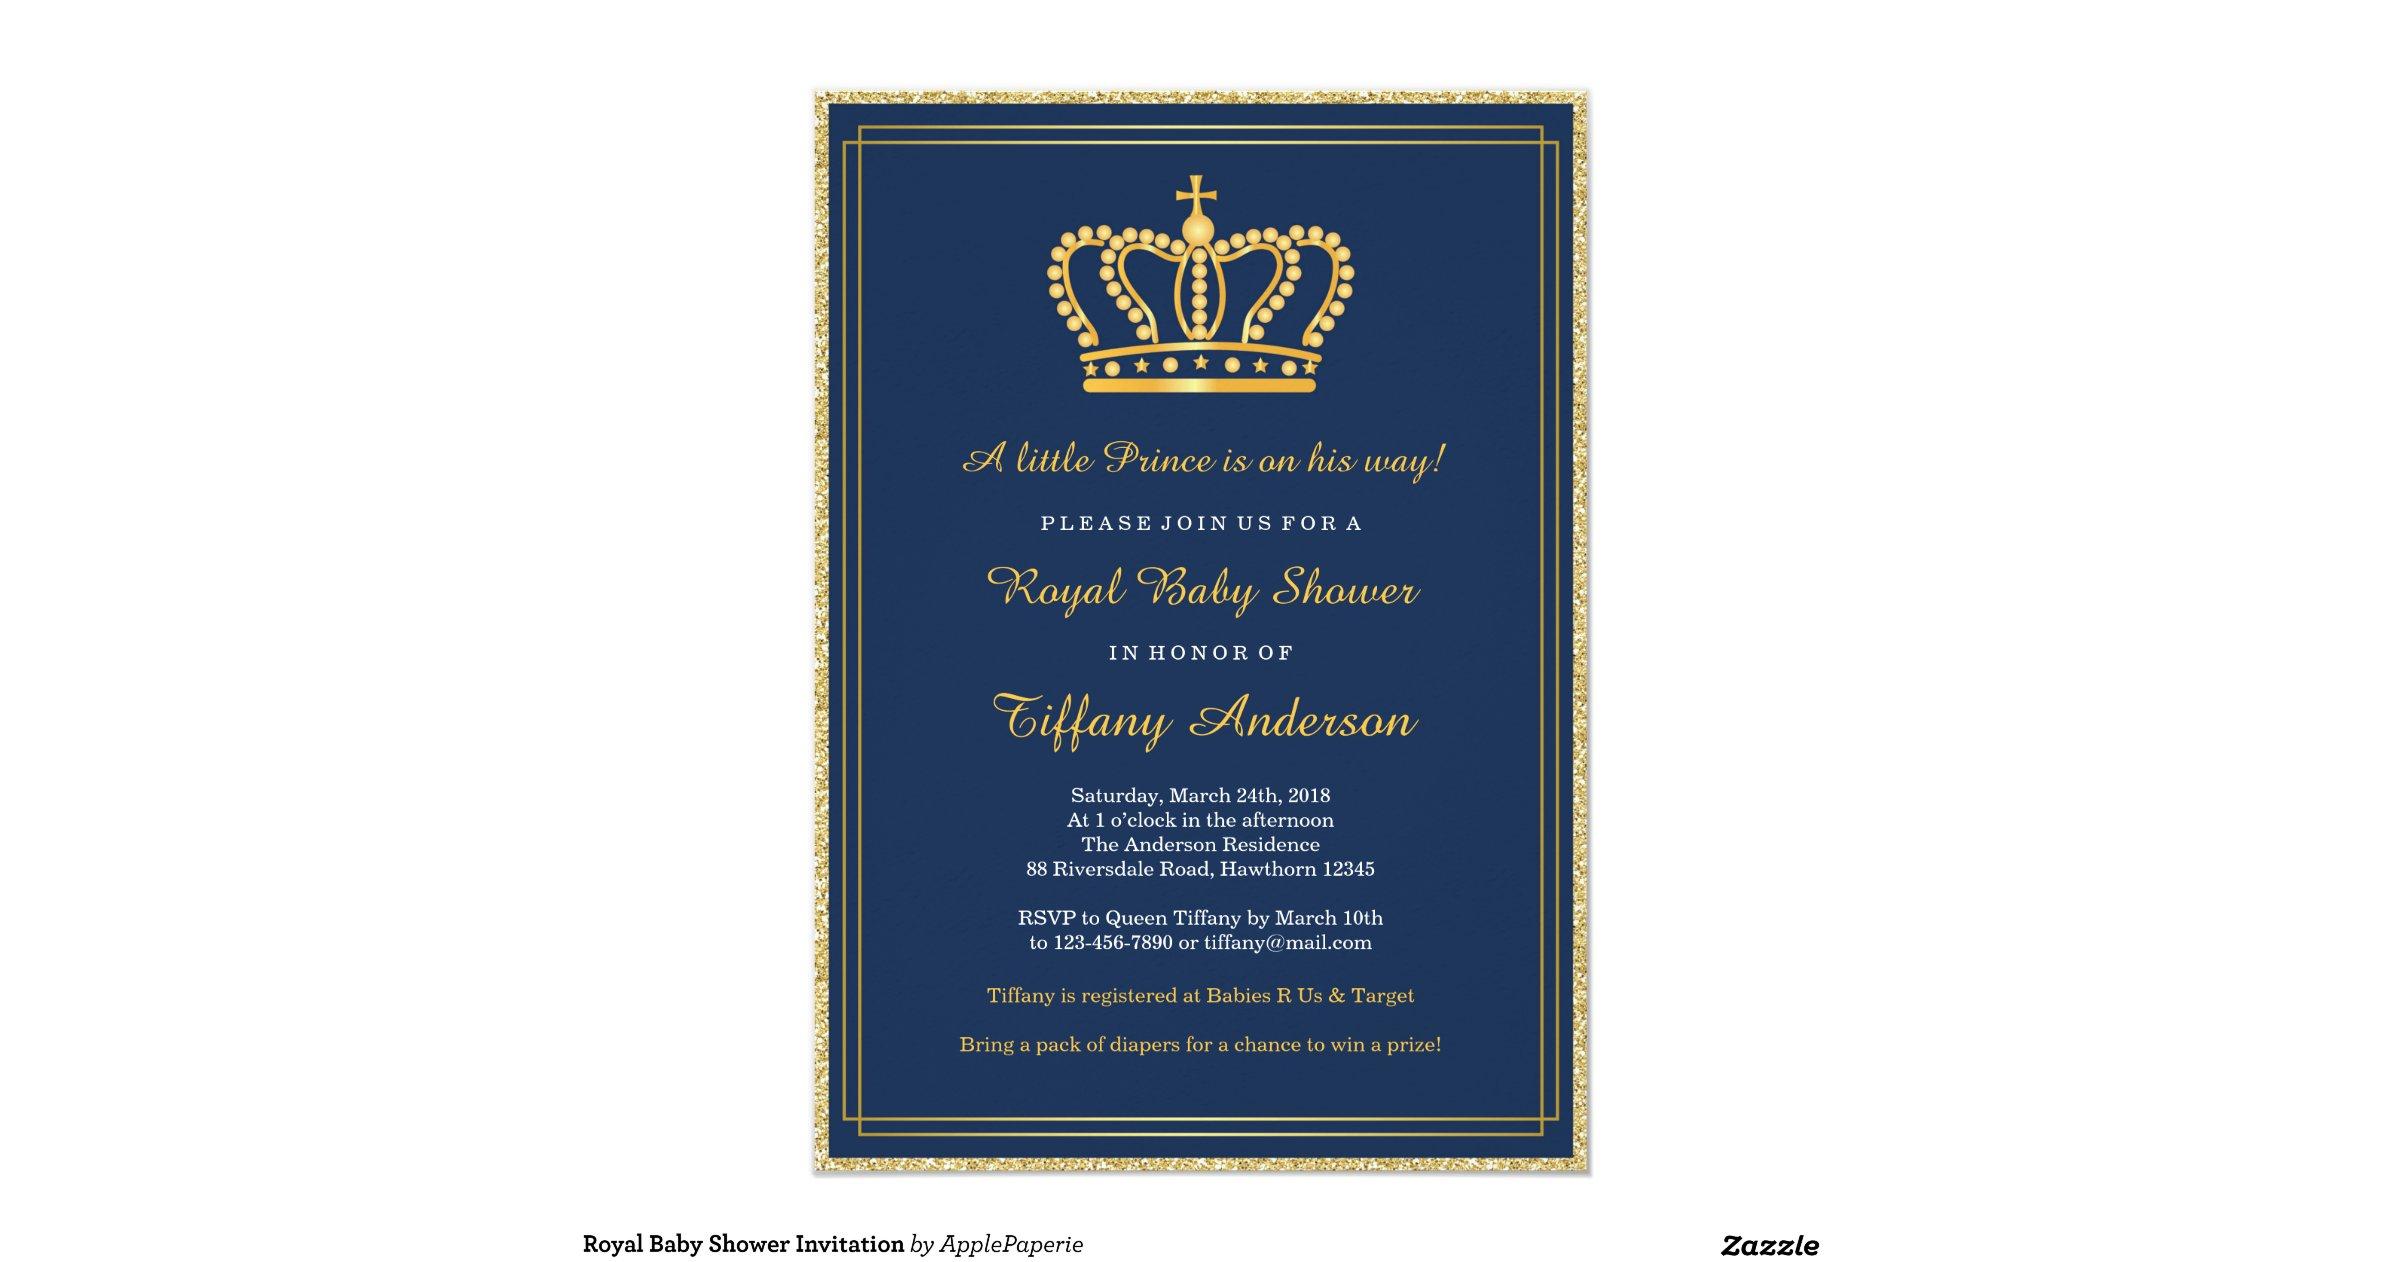 royal baby shower invitation r86badf3f960043b28bb2d0dcd5b6c77f zkrqs